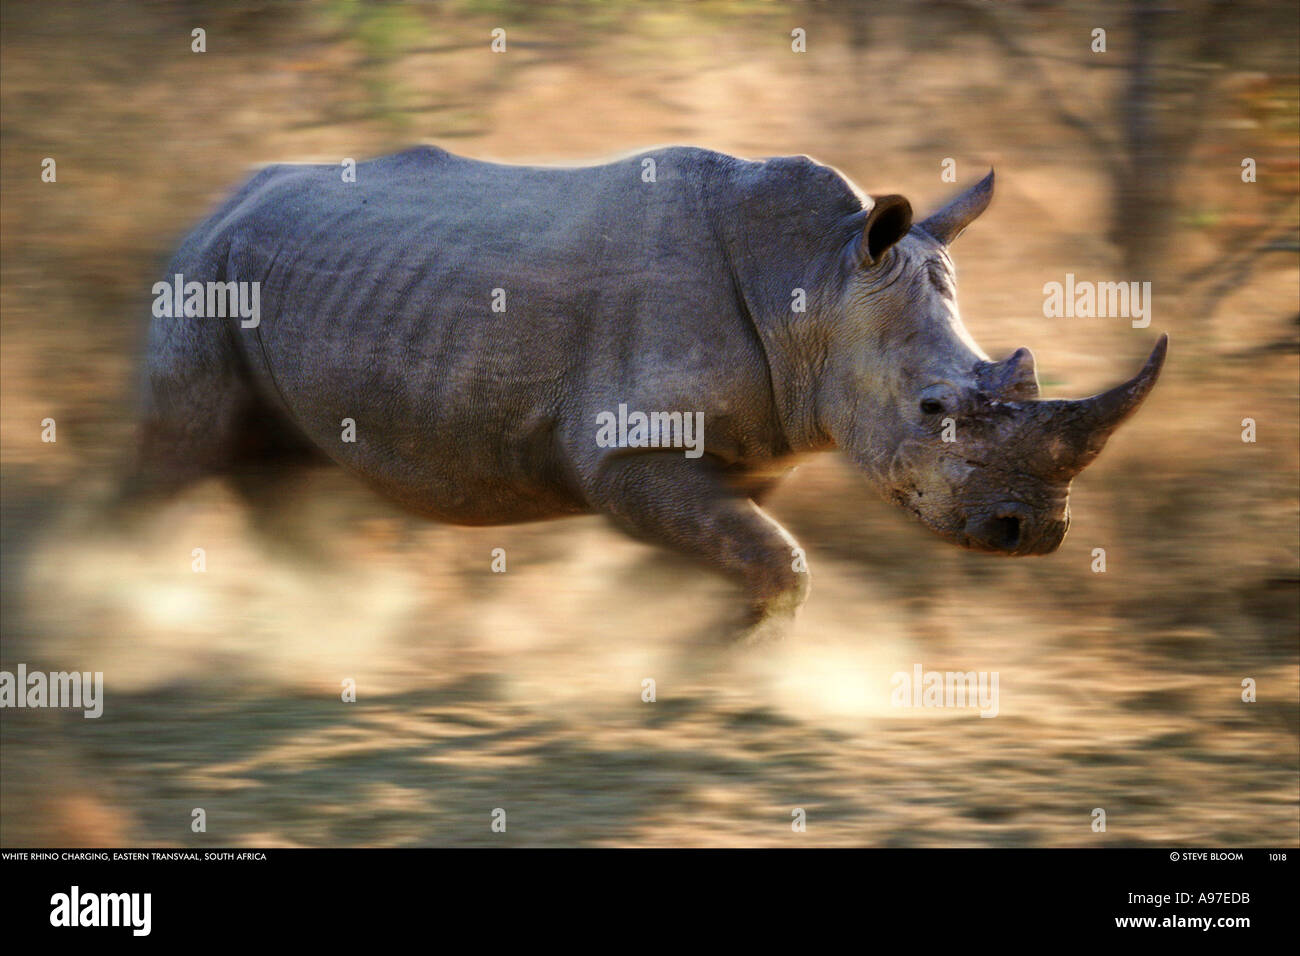 Charging white rhino Kapama Game Reserve South Africa - Stock Image